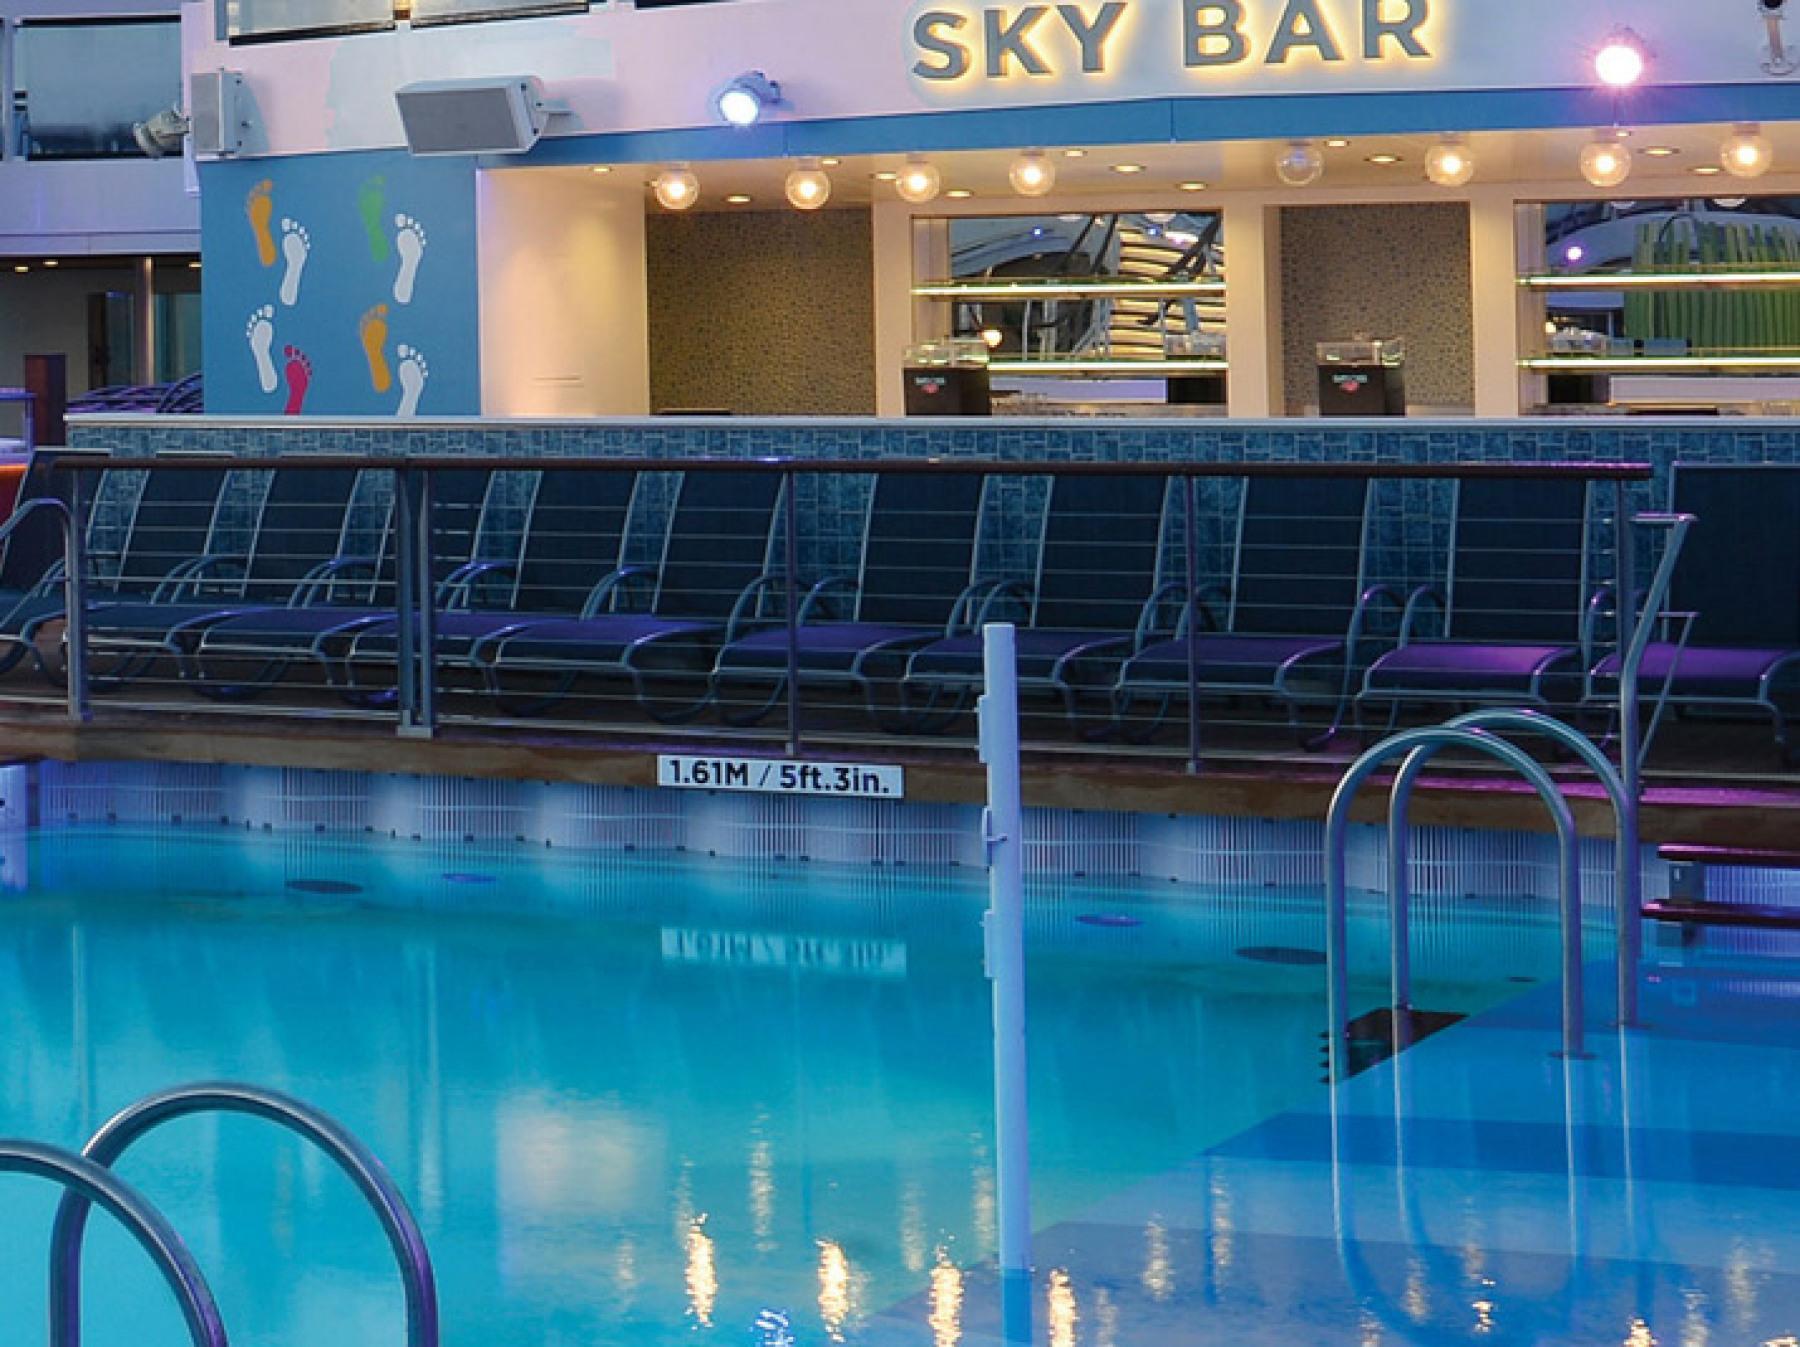 Royal Caribbean International Jewel of the Seas Accommodation Exterior Pool Bar.jpg